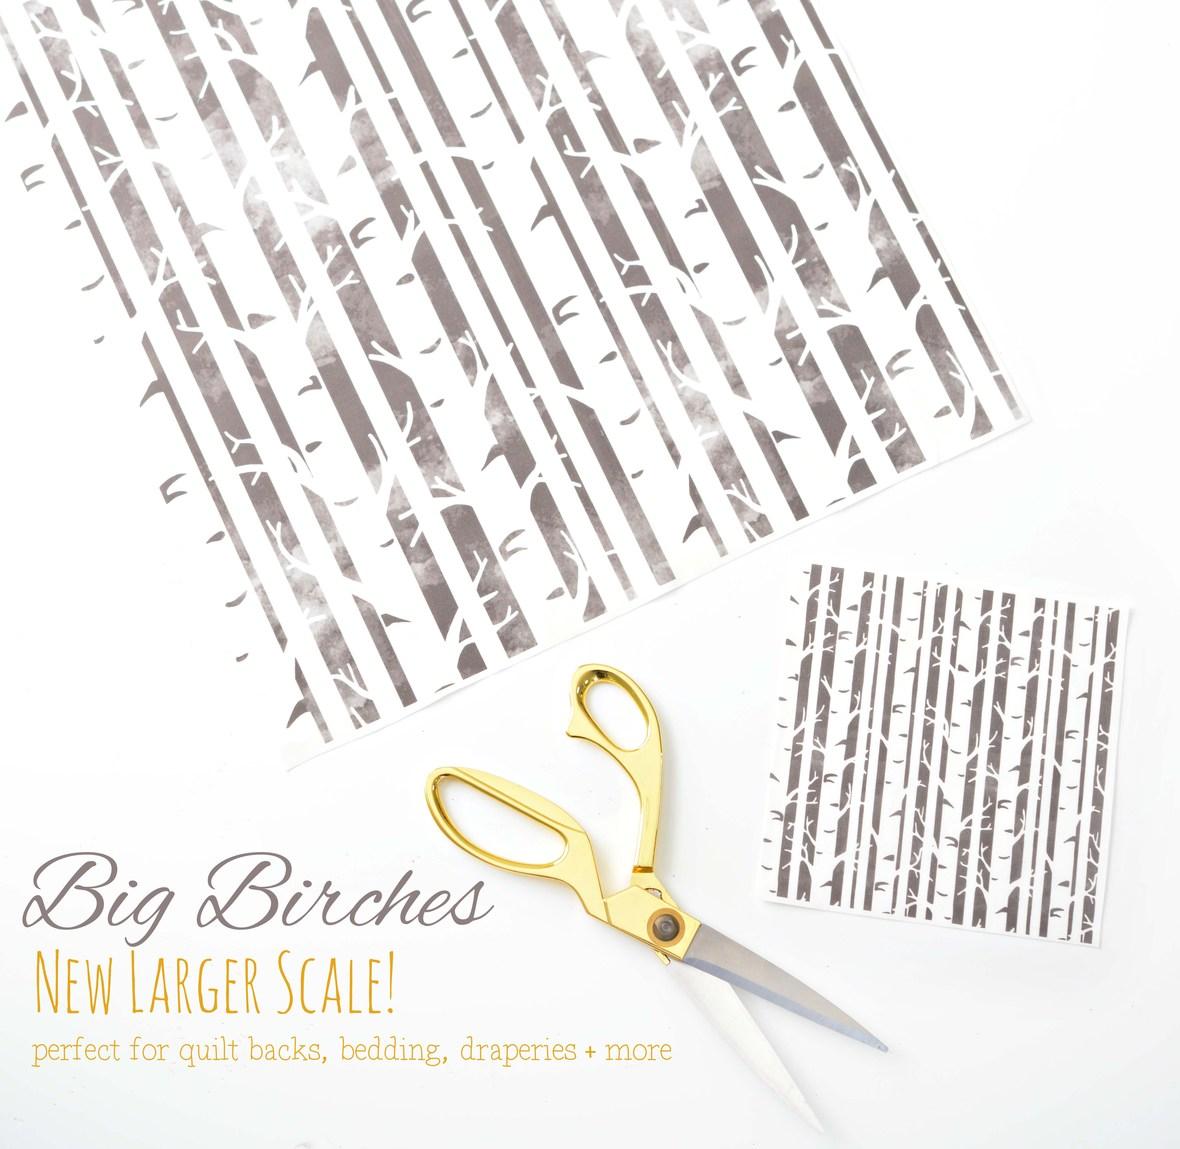 Big Birches Basic